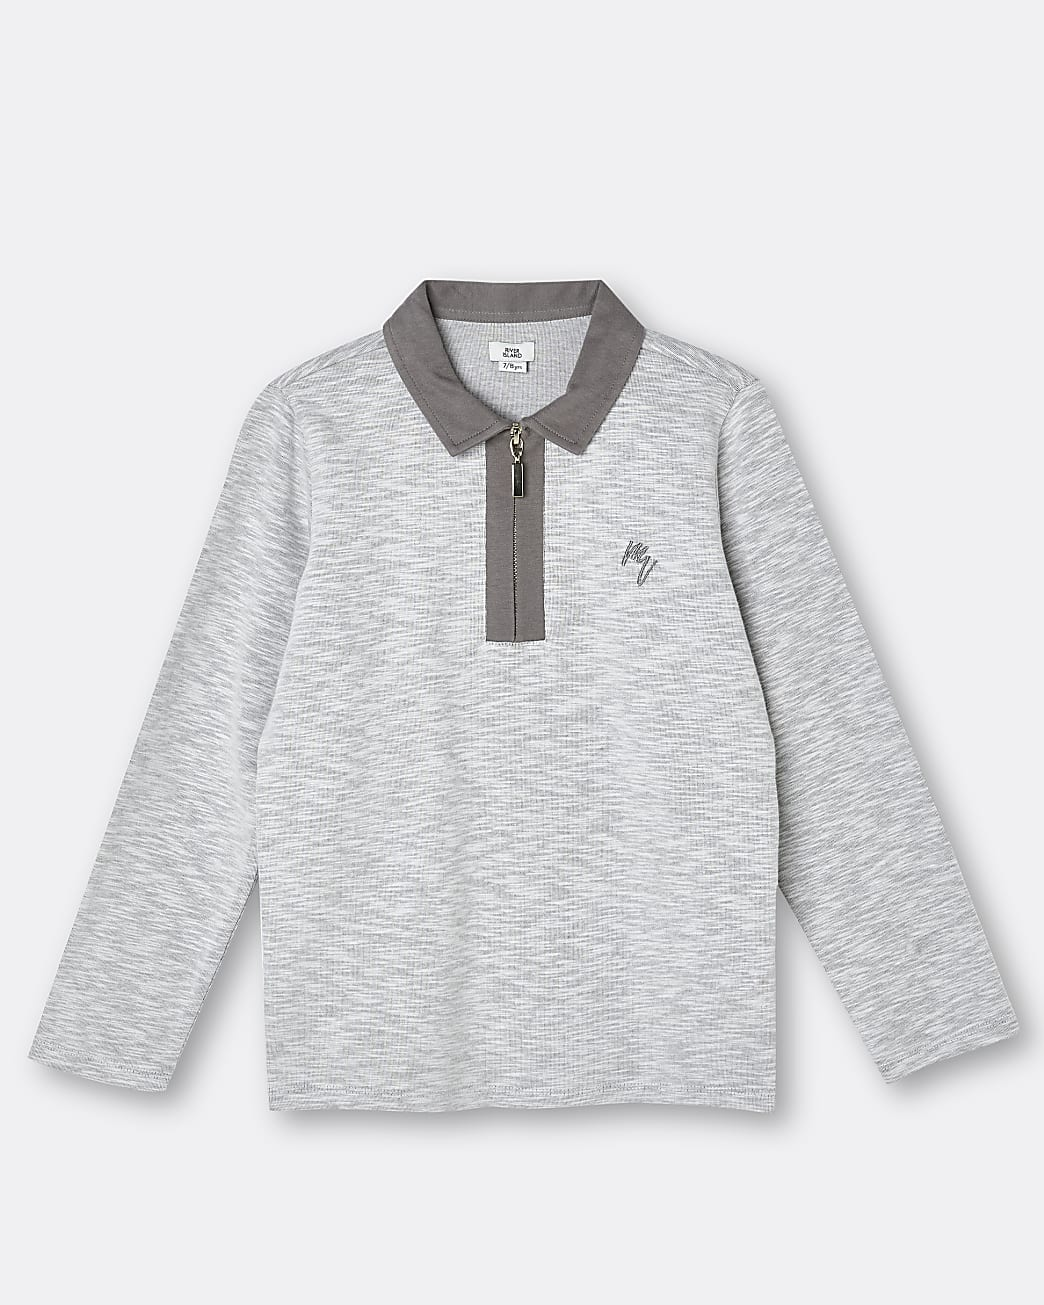 Boys grey Maison Riviera polo shirt